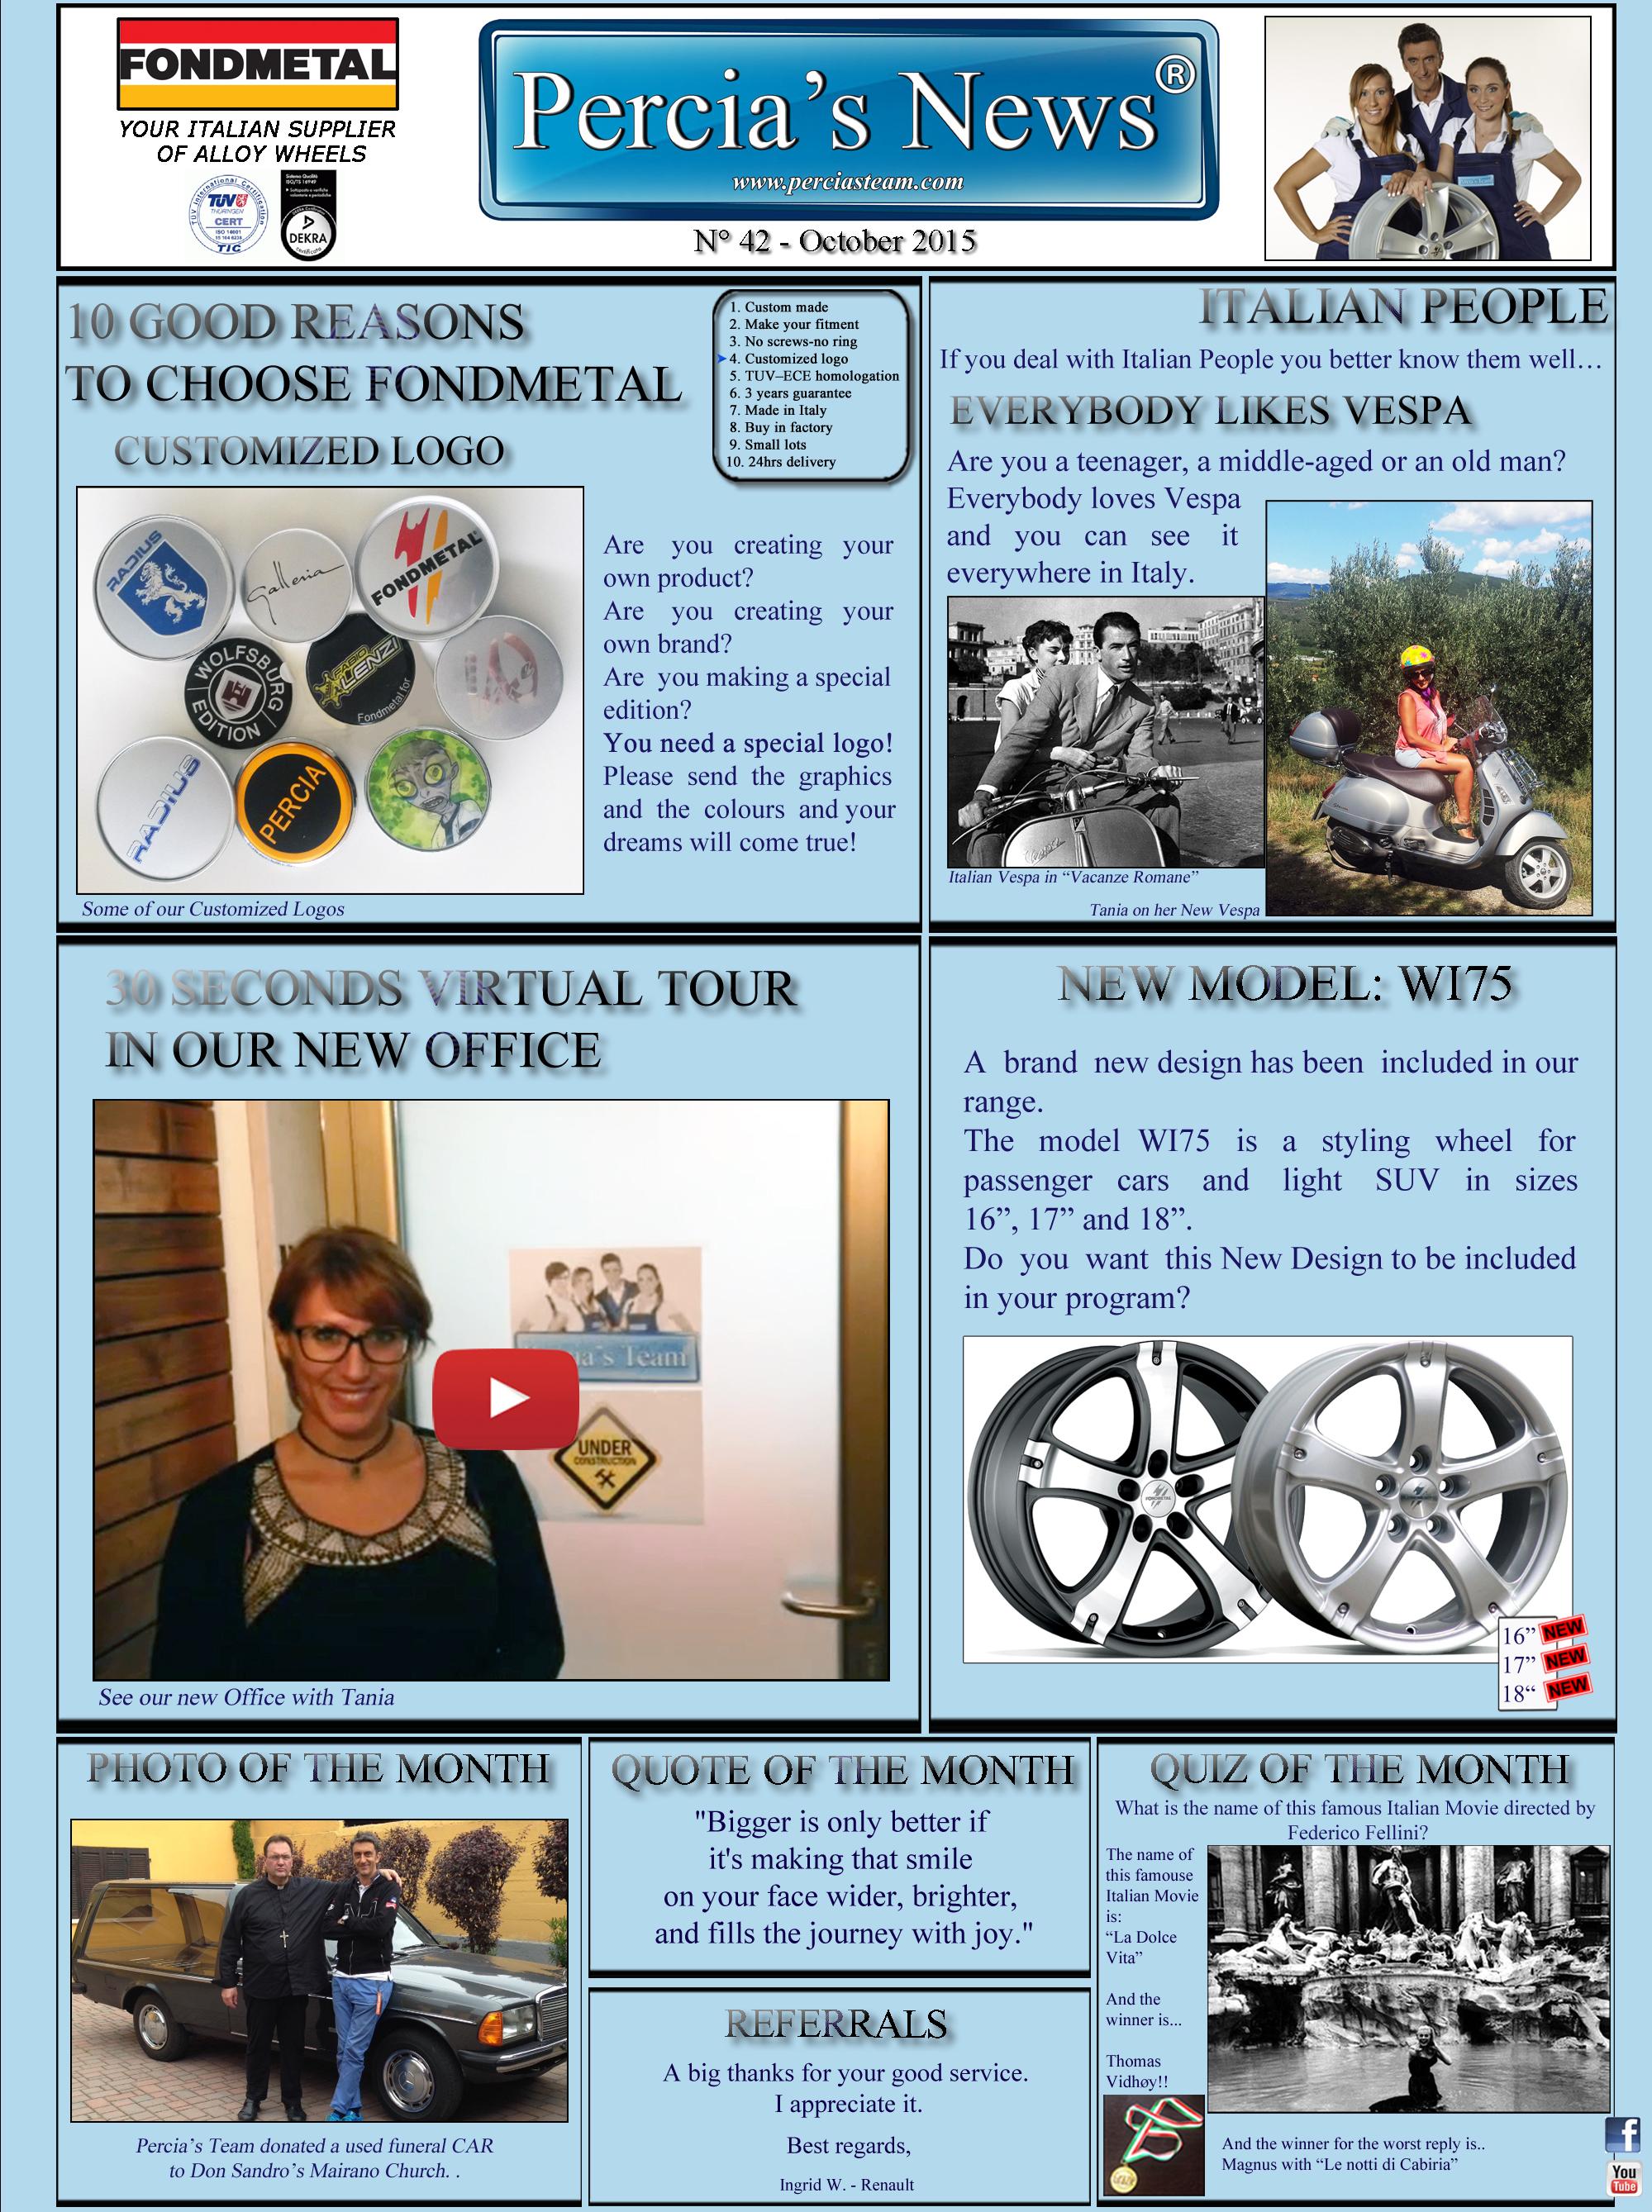 PERCIA'S NEWS - OCTOBER 2015